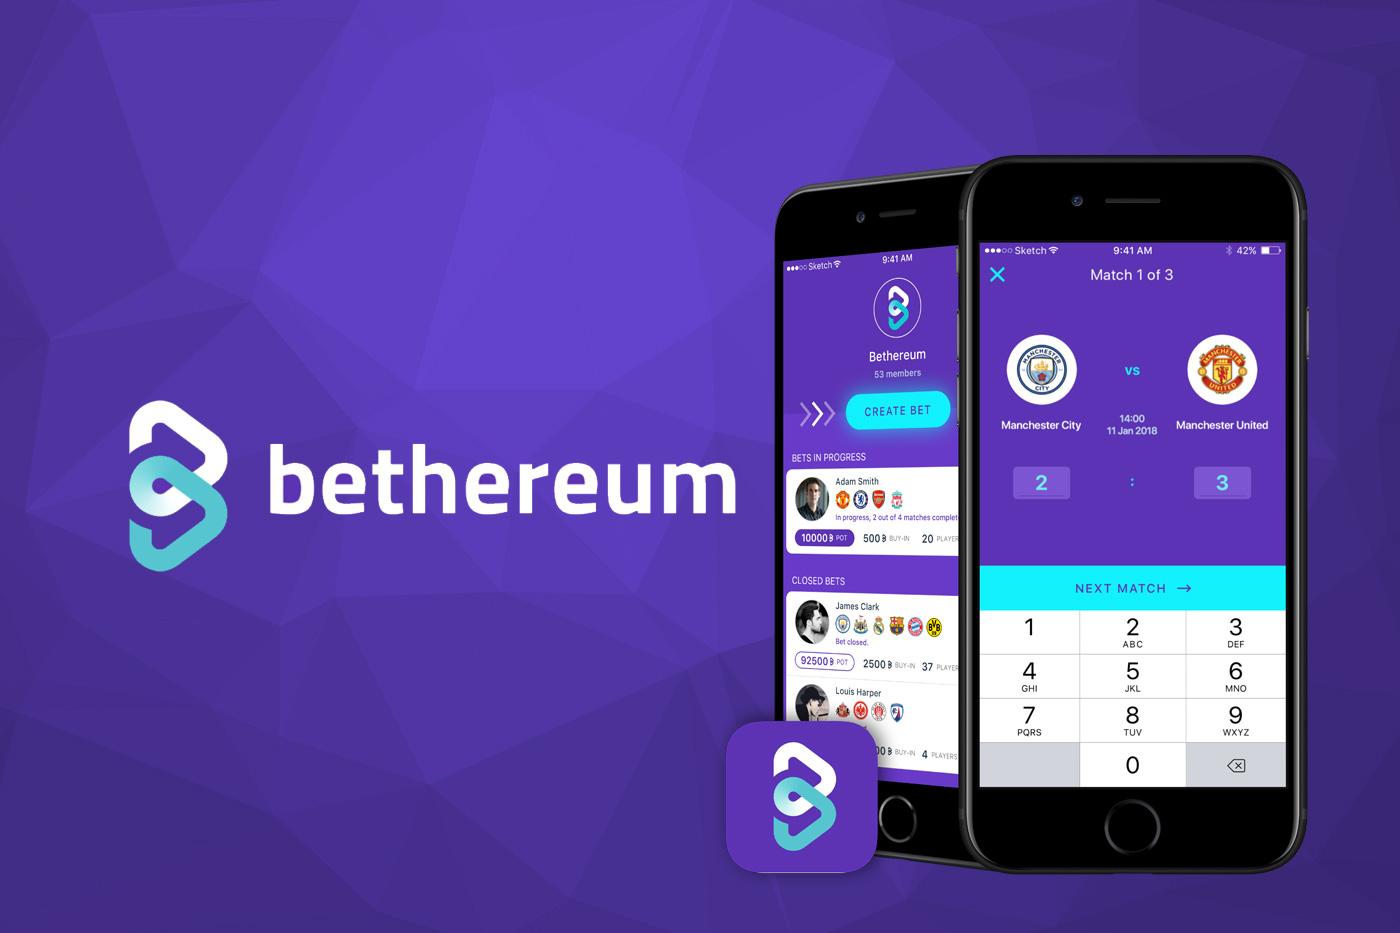 The Bethereum logo. Betherium is a blockchain based betting platform.